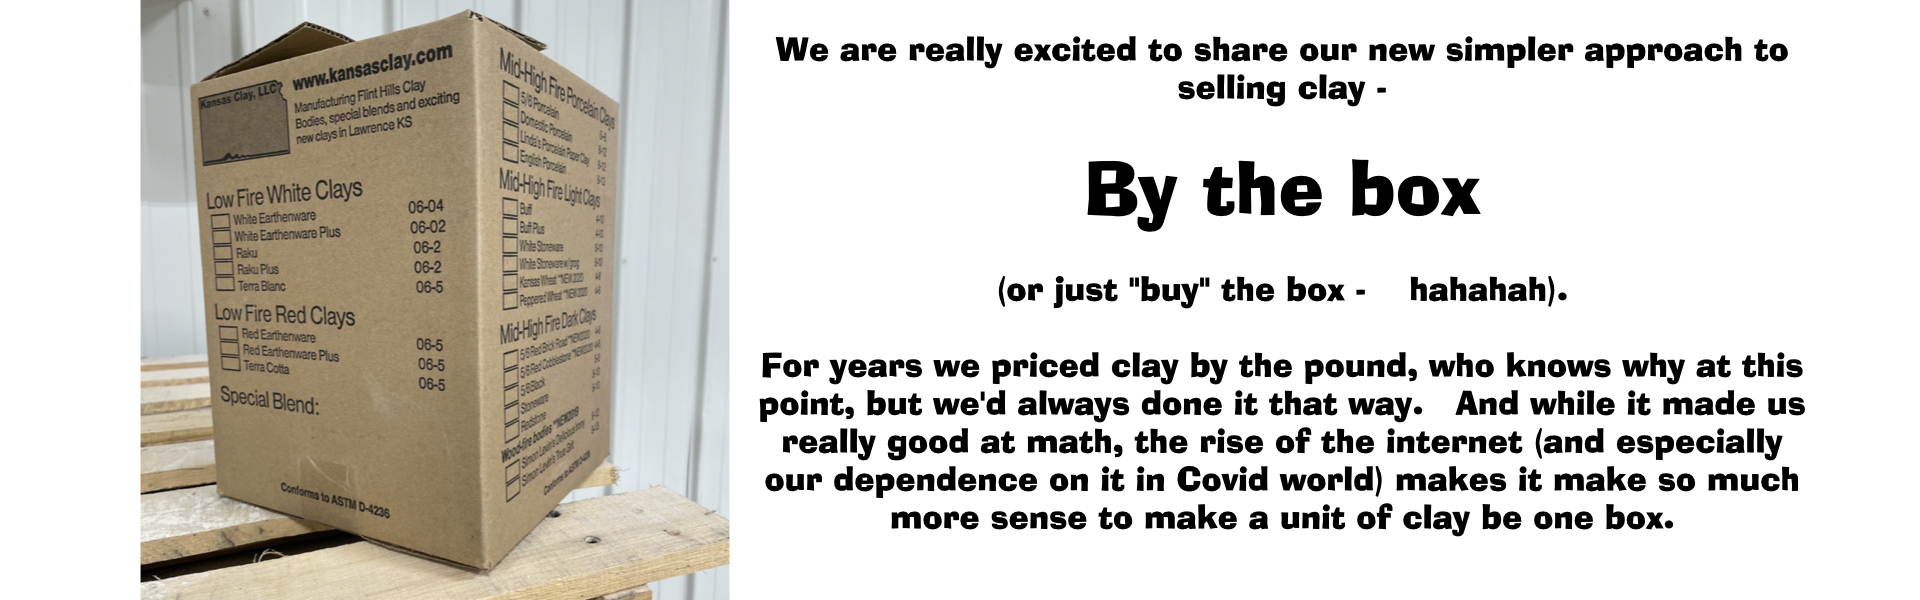 clay-box.001.jpeg